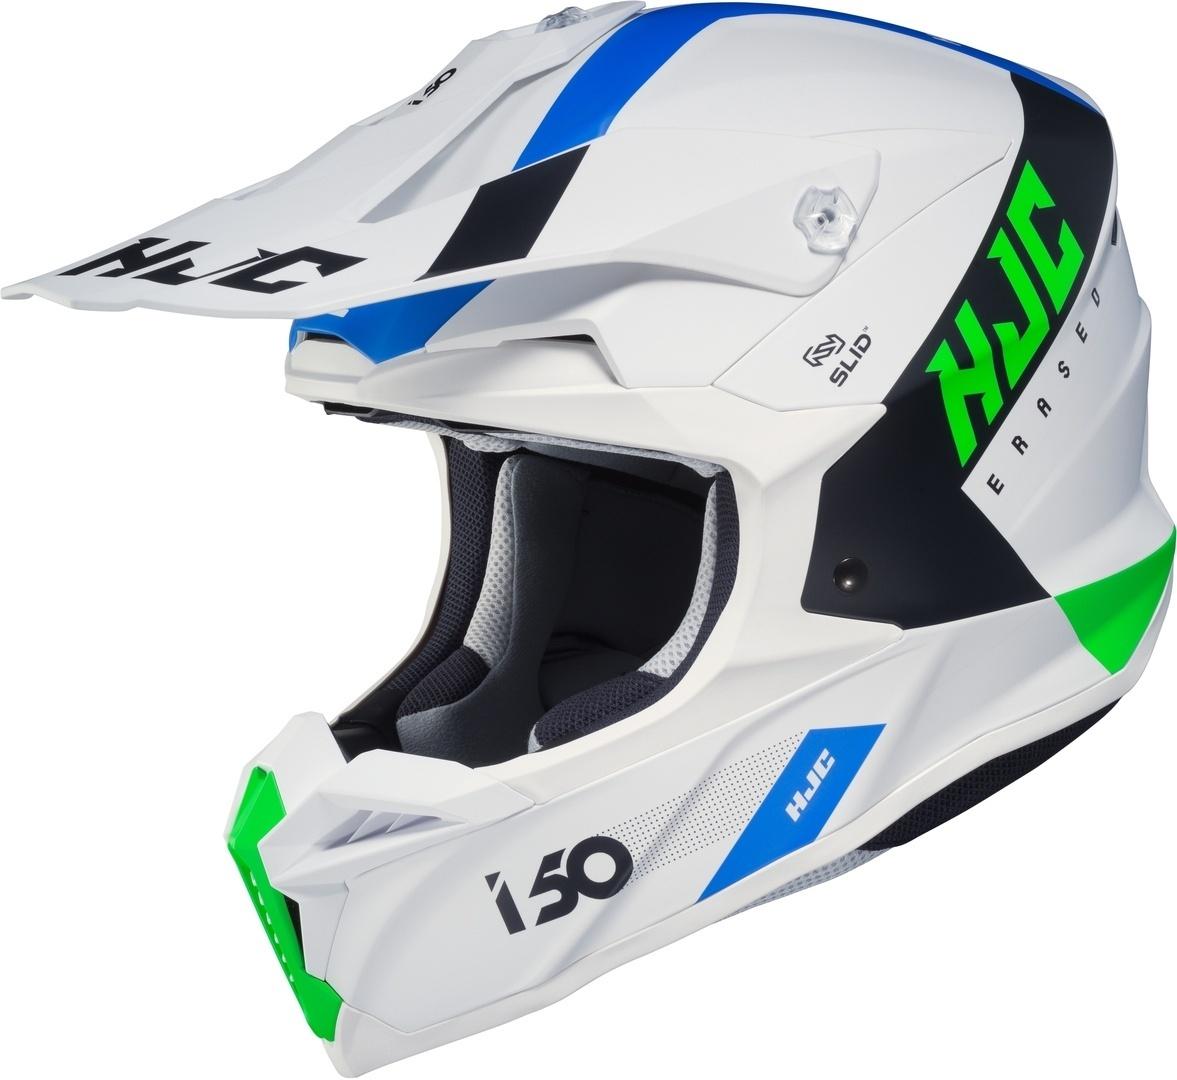 HJC i50 Erased Motocross Helm, weiss-blau, Größe M, weiss-blau, Größe M